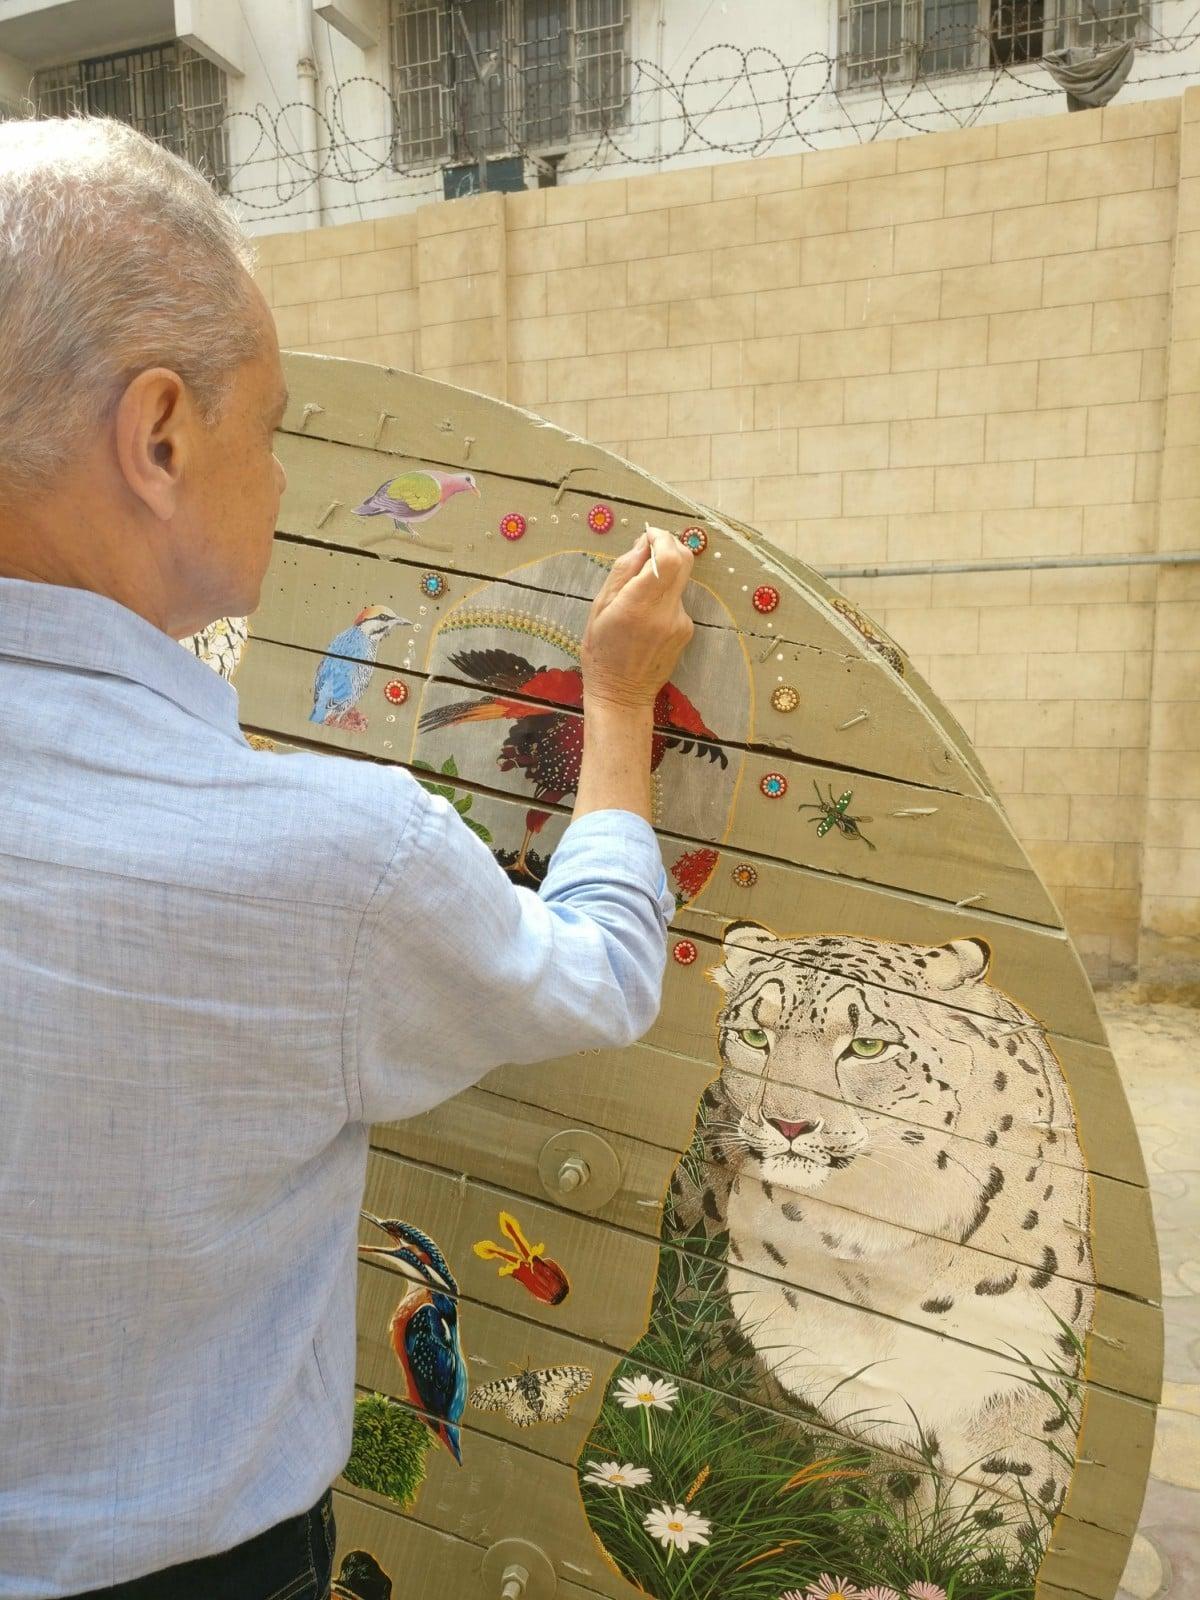 Maurizio Boscheri returns to paint a spool